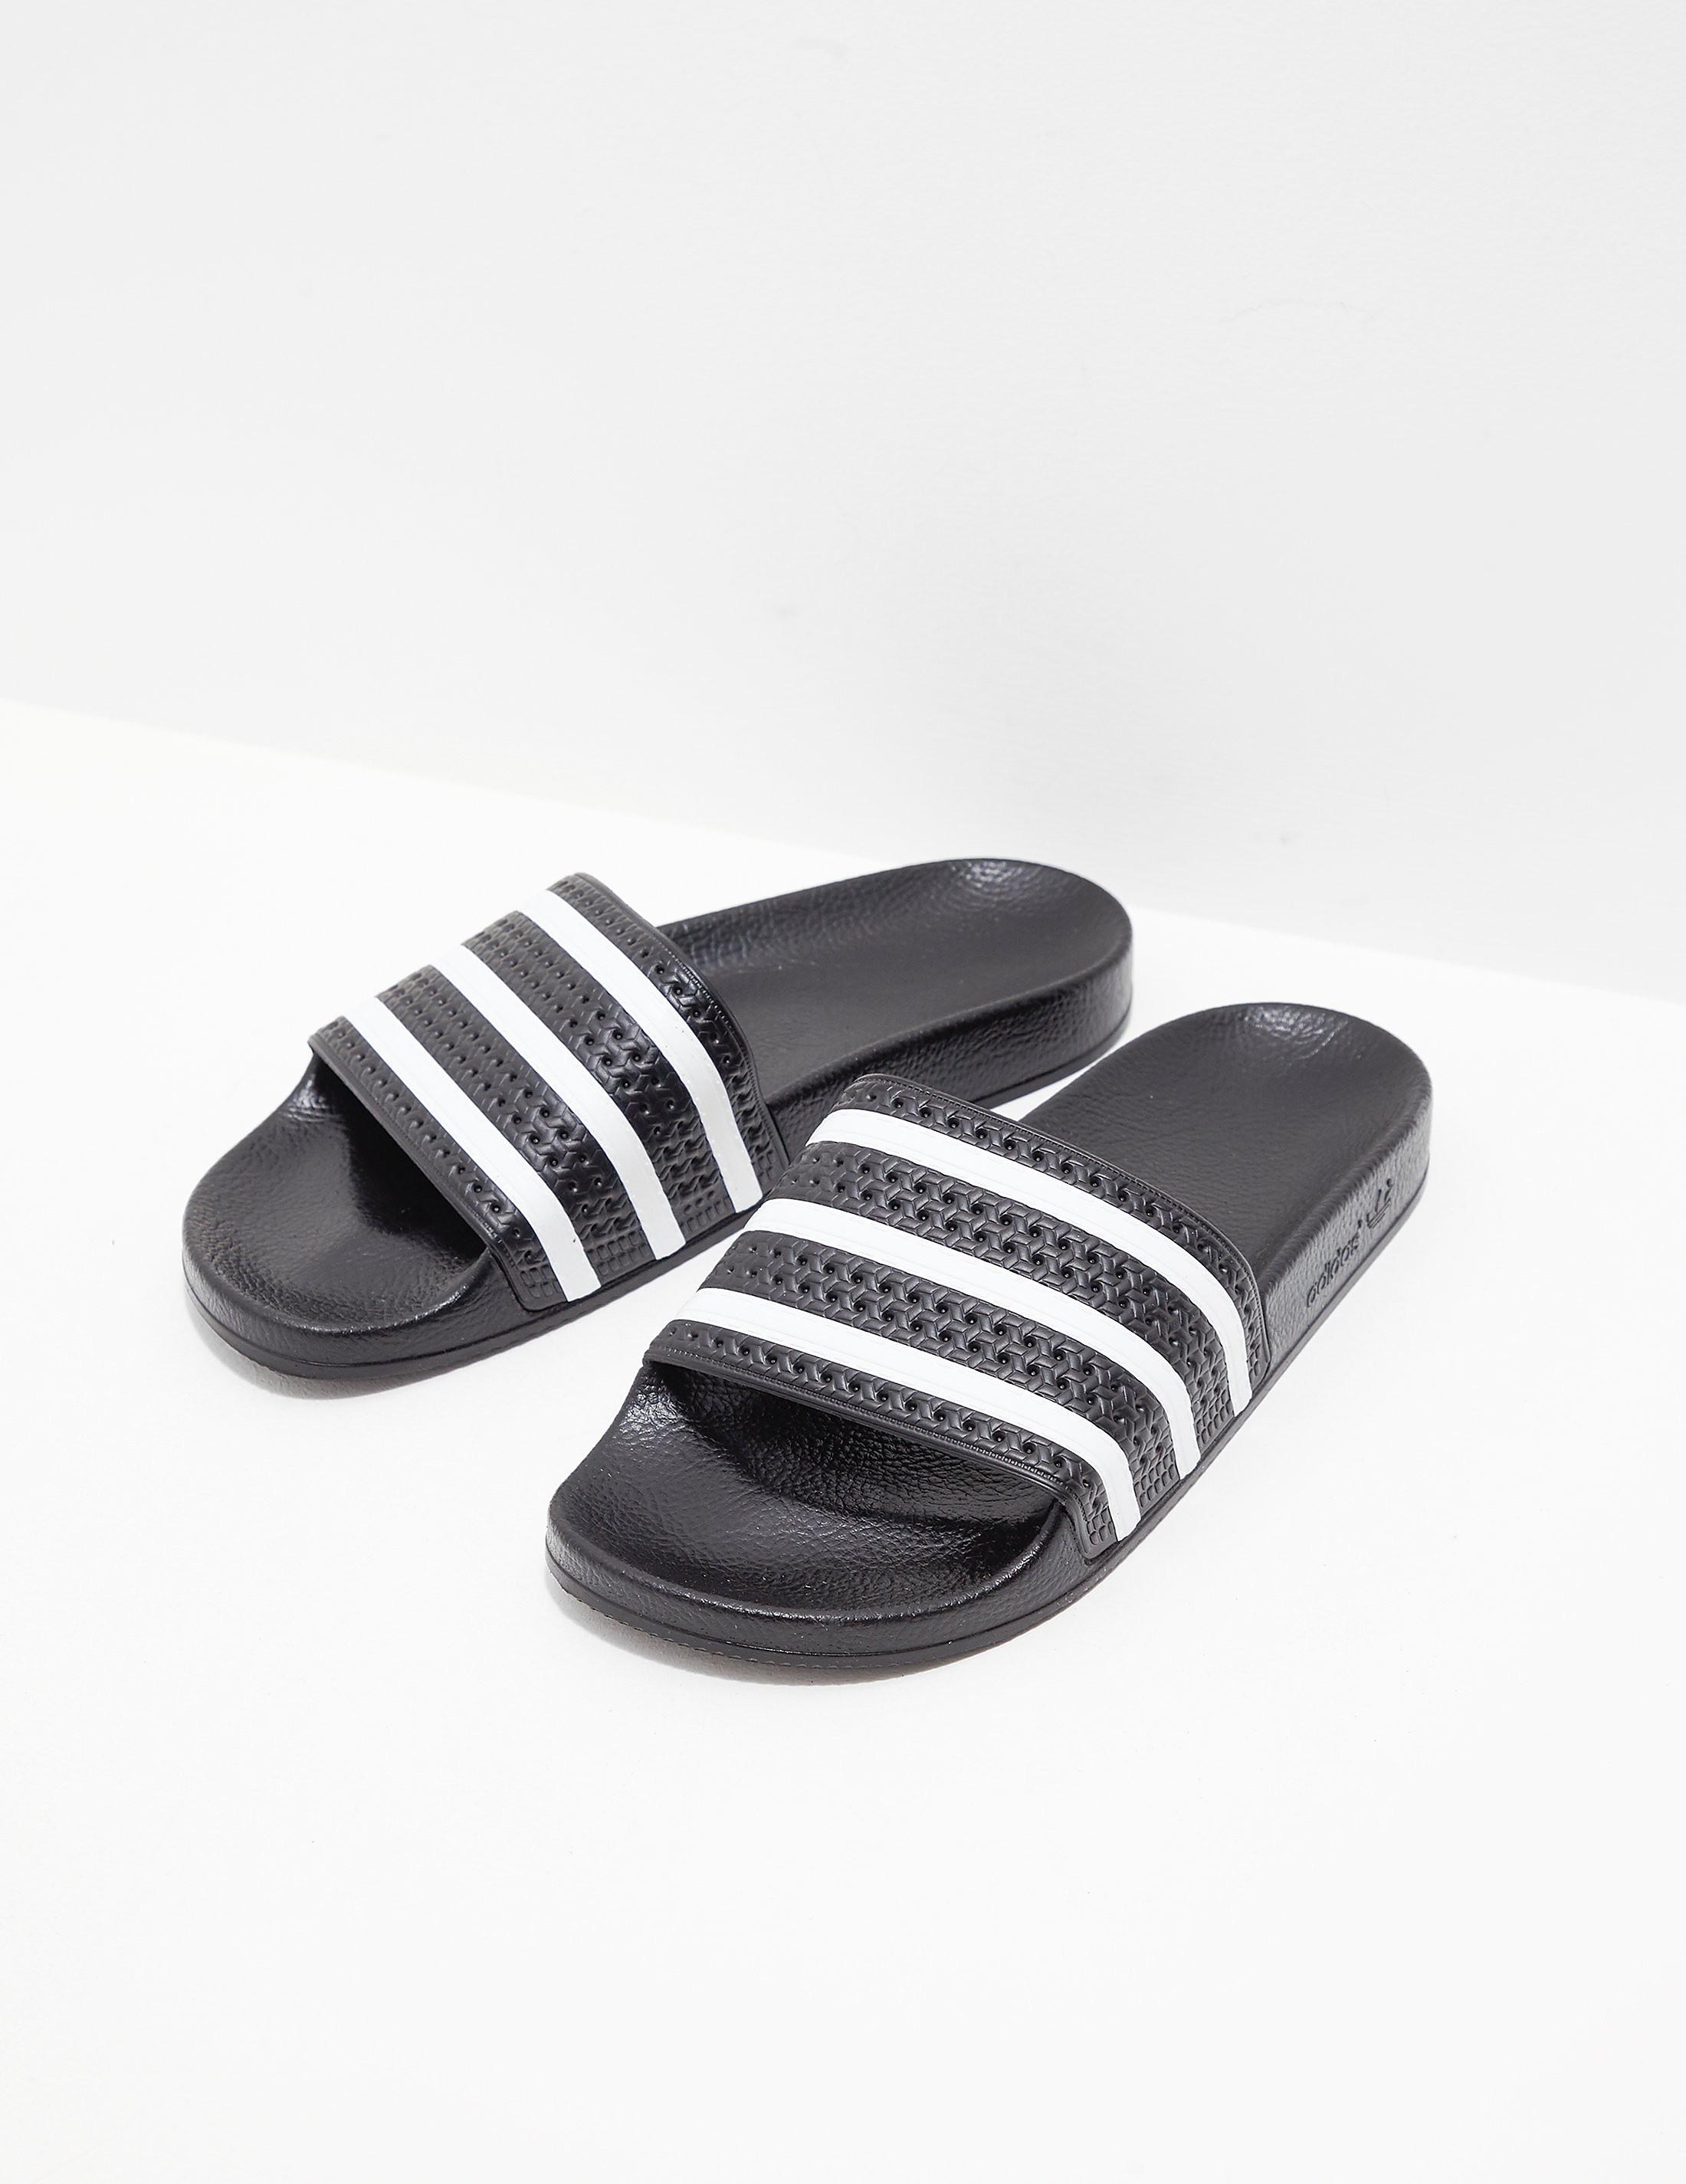 aa1f1c6eb Mens adidas Originals Adilette Slides Black